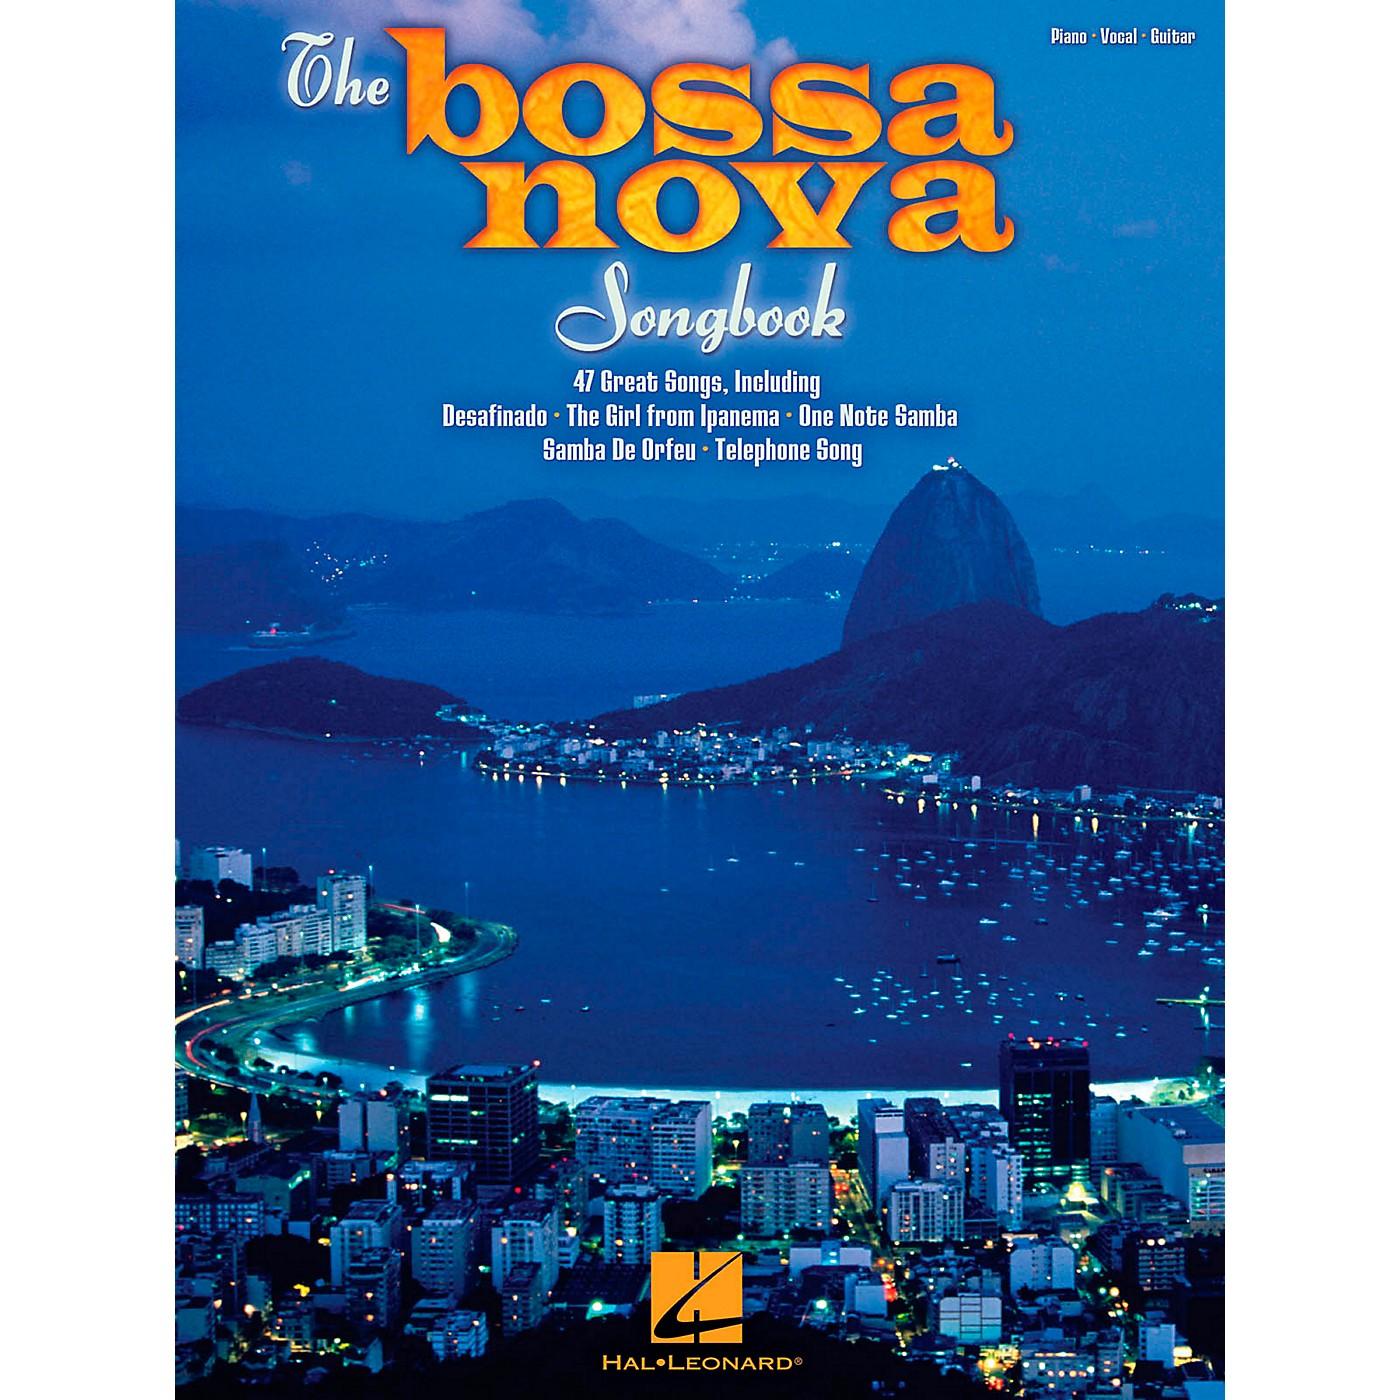 Hal Leonard The Bossa Nova Songbook for Piano/Vocal/Guitar PVG thumbnail